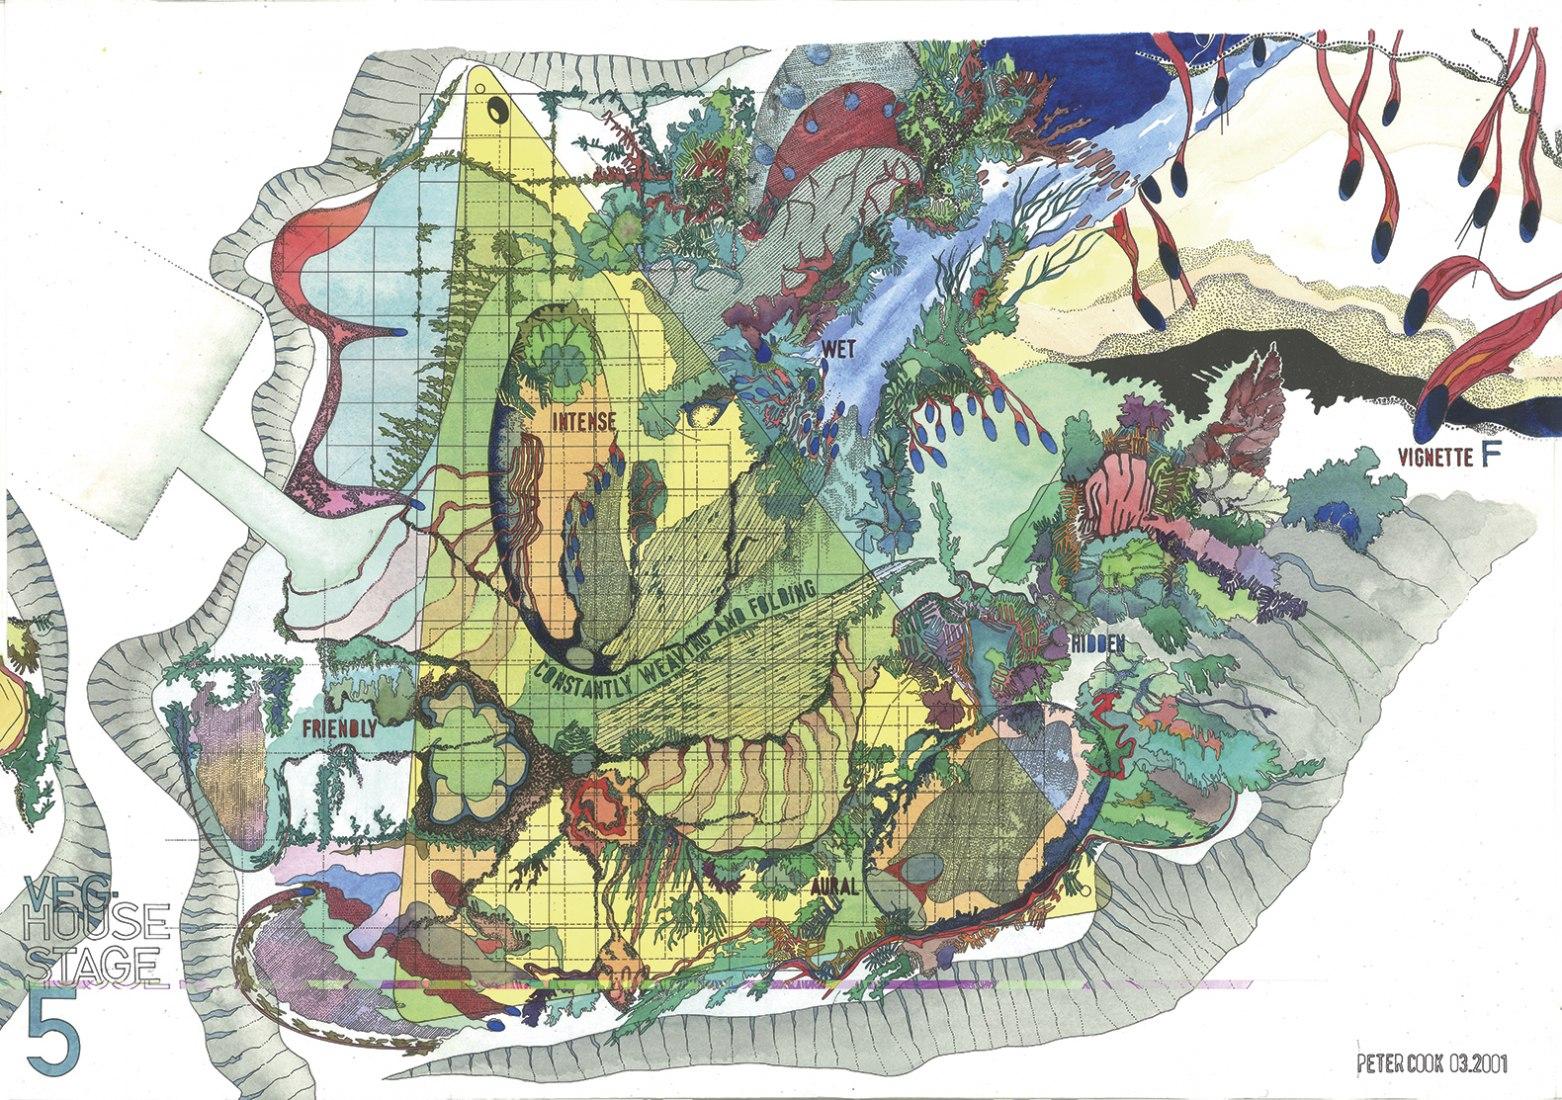 Casa Veg: Fase 5 por Peter Cook. Grabado, acuarela. 2001. 50 x 70 cm. Imagen © Peter Cook.